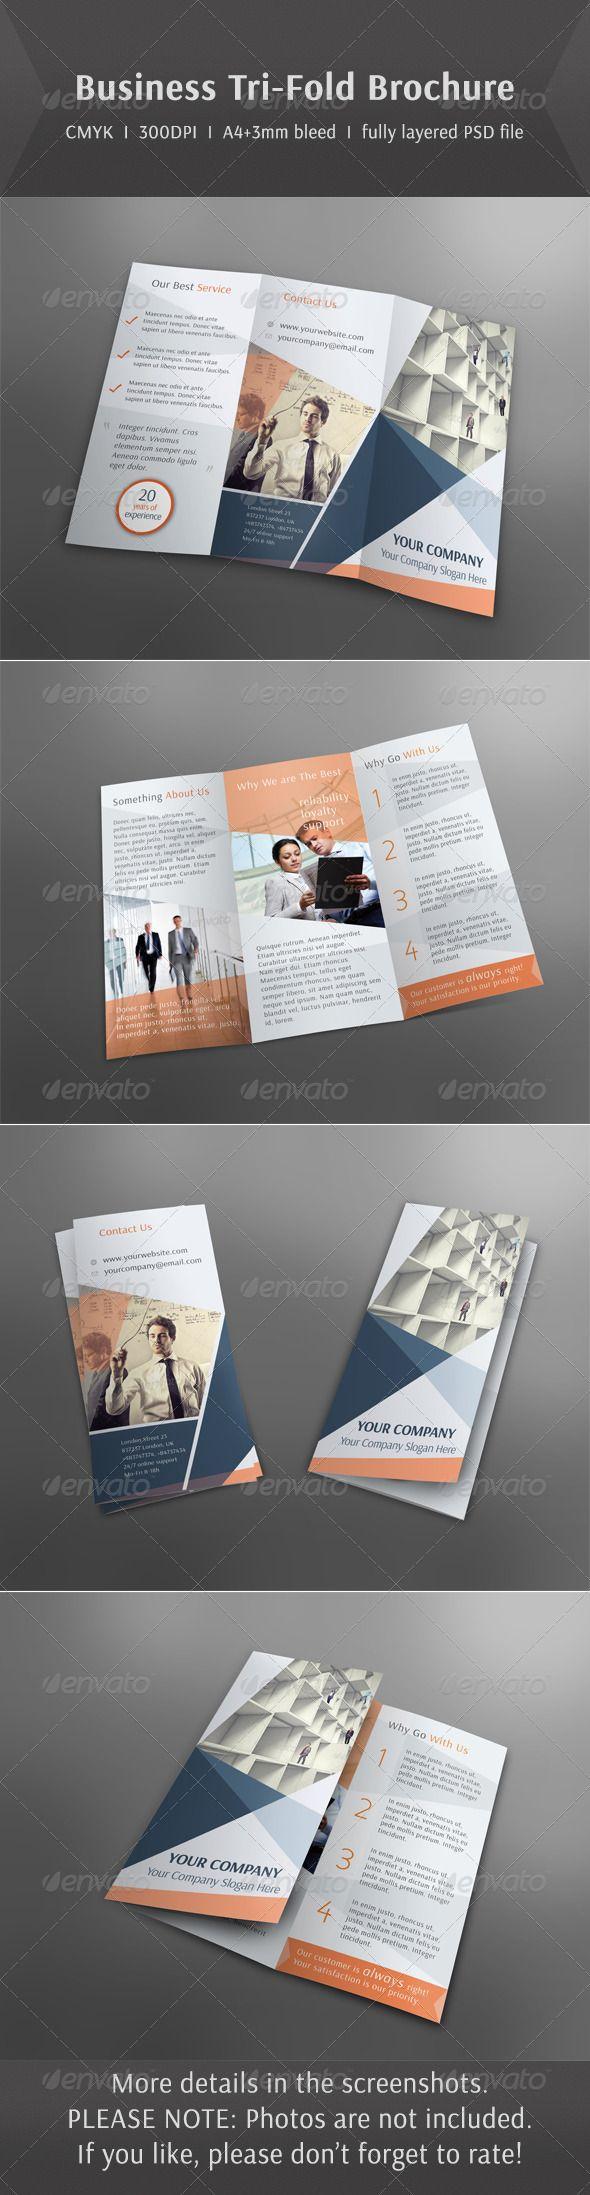 The Best Tri Fold Brochure Template Ideas On Pinterest Tri - Template for a brochure